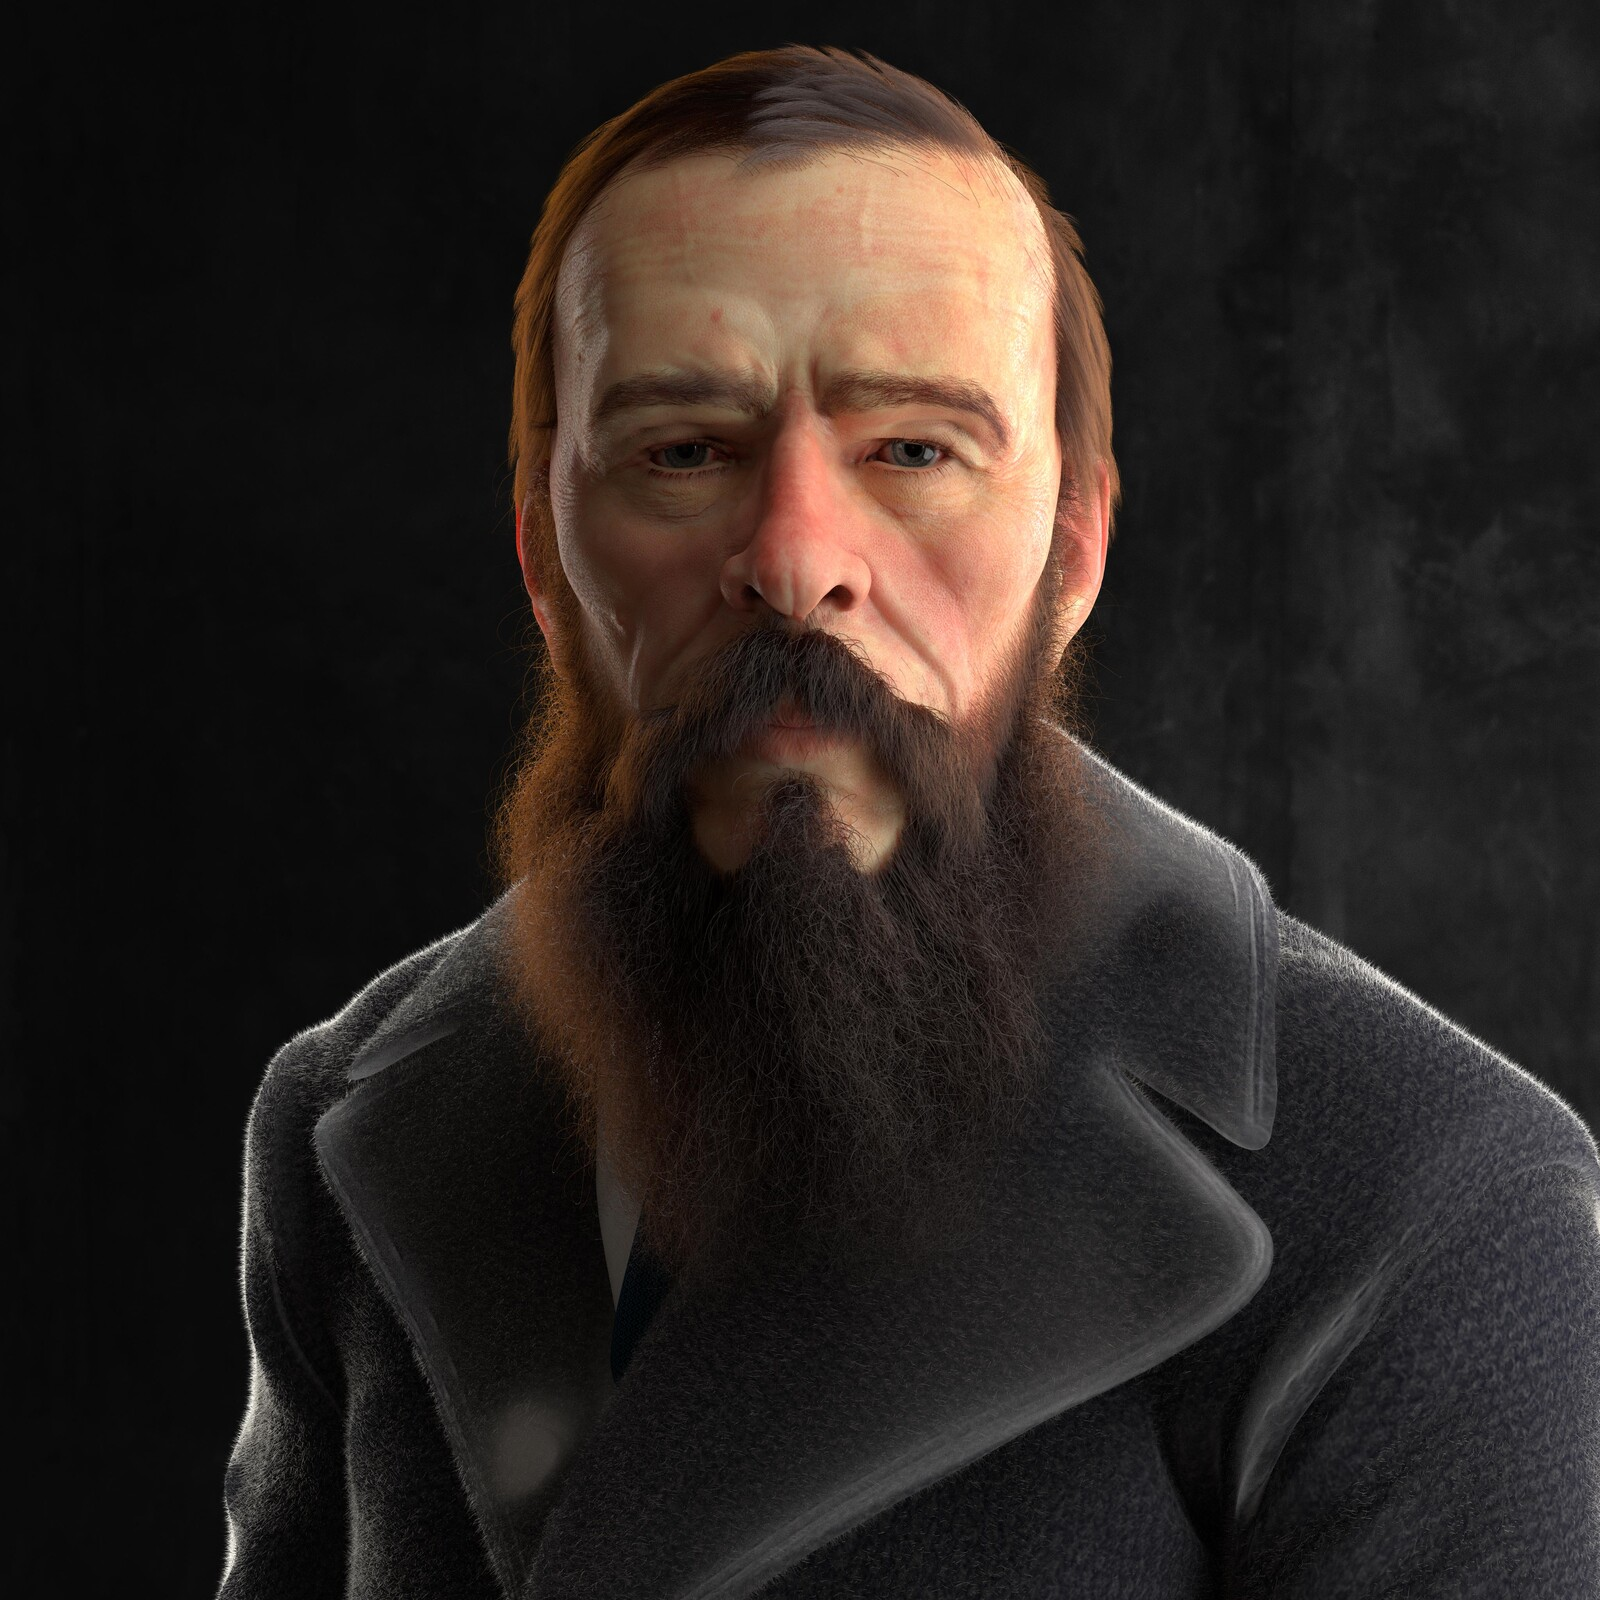 Fyodor Mikhailovich Dostoevsky Work in Progress Portrait